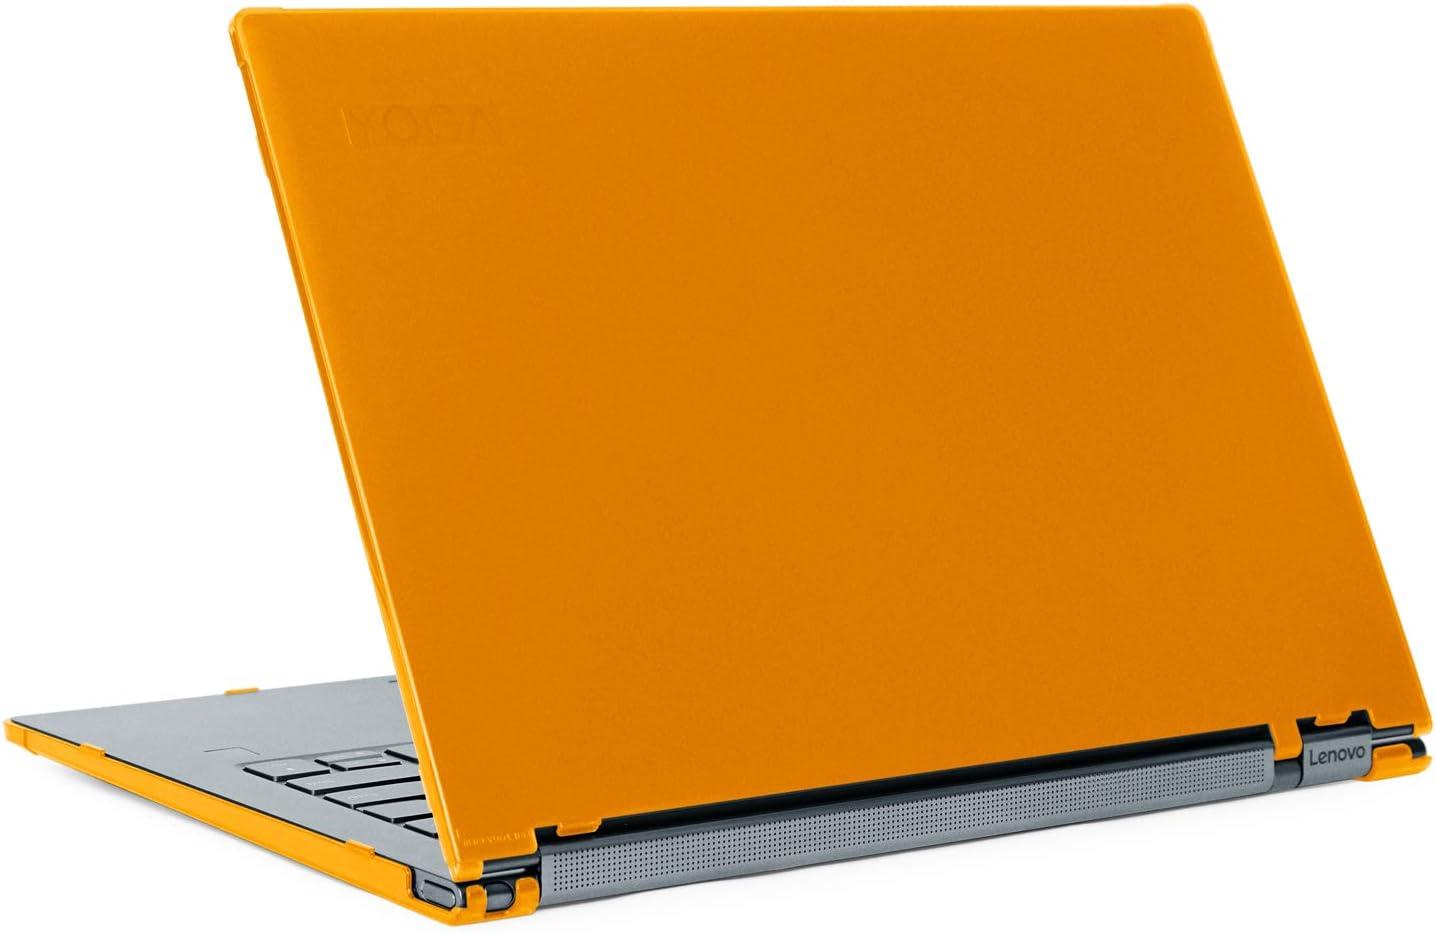 "mCover Hard Shell Case for Late-2019 14"" Lenovo Yoga C940 Series (NOT Fitting Older Yoga 900/910 / 920 / C930) multimode Laptop Computer (14-Inch Yoga C940, Orange)"